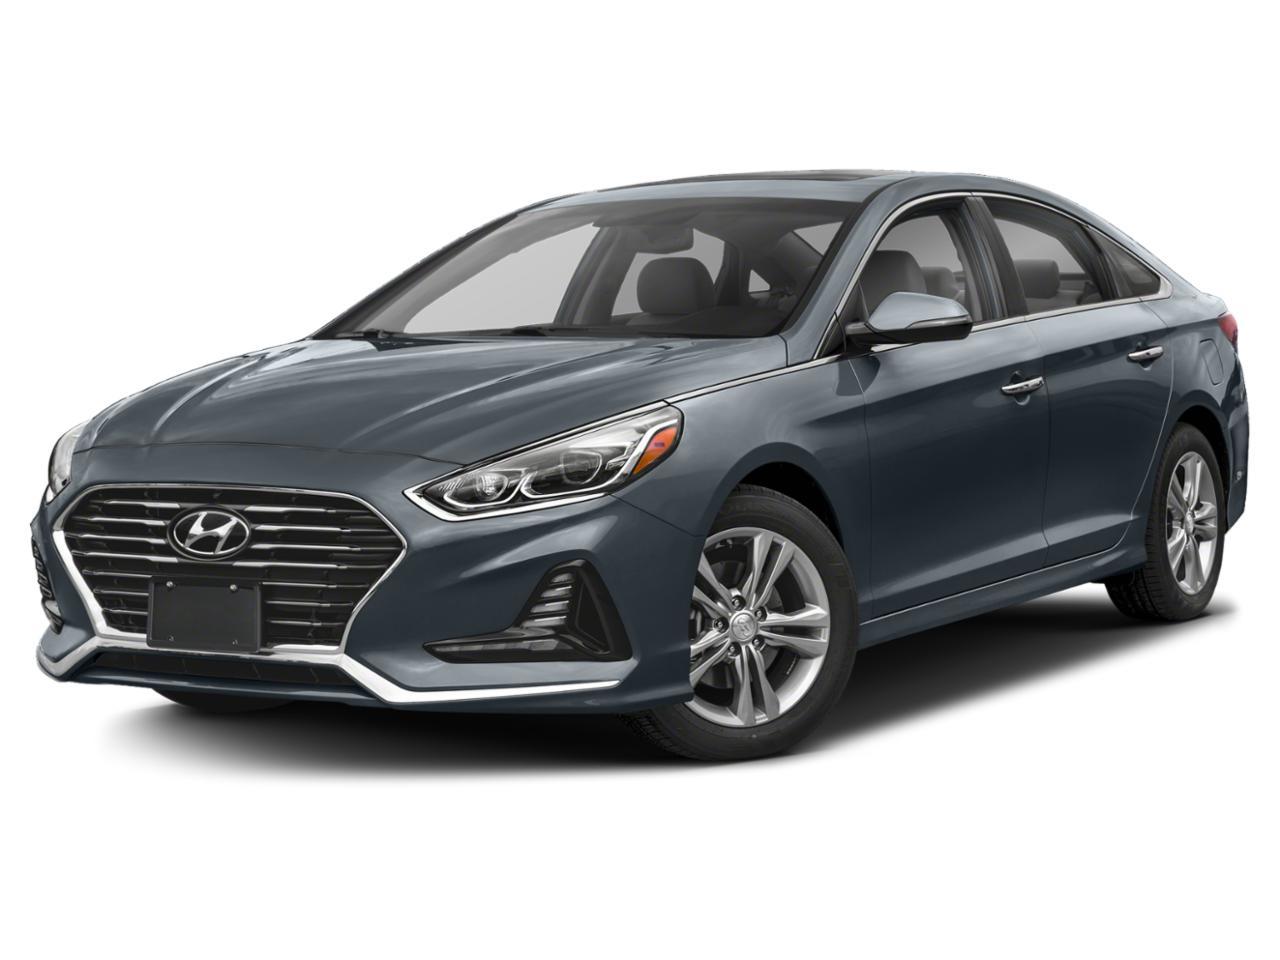 2018 Hyundai Sonata Vehicle Photo in Peoria, IL 61615